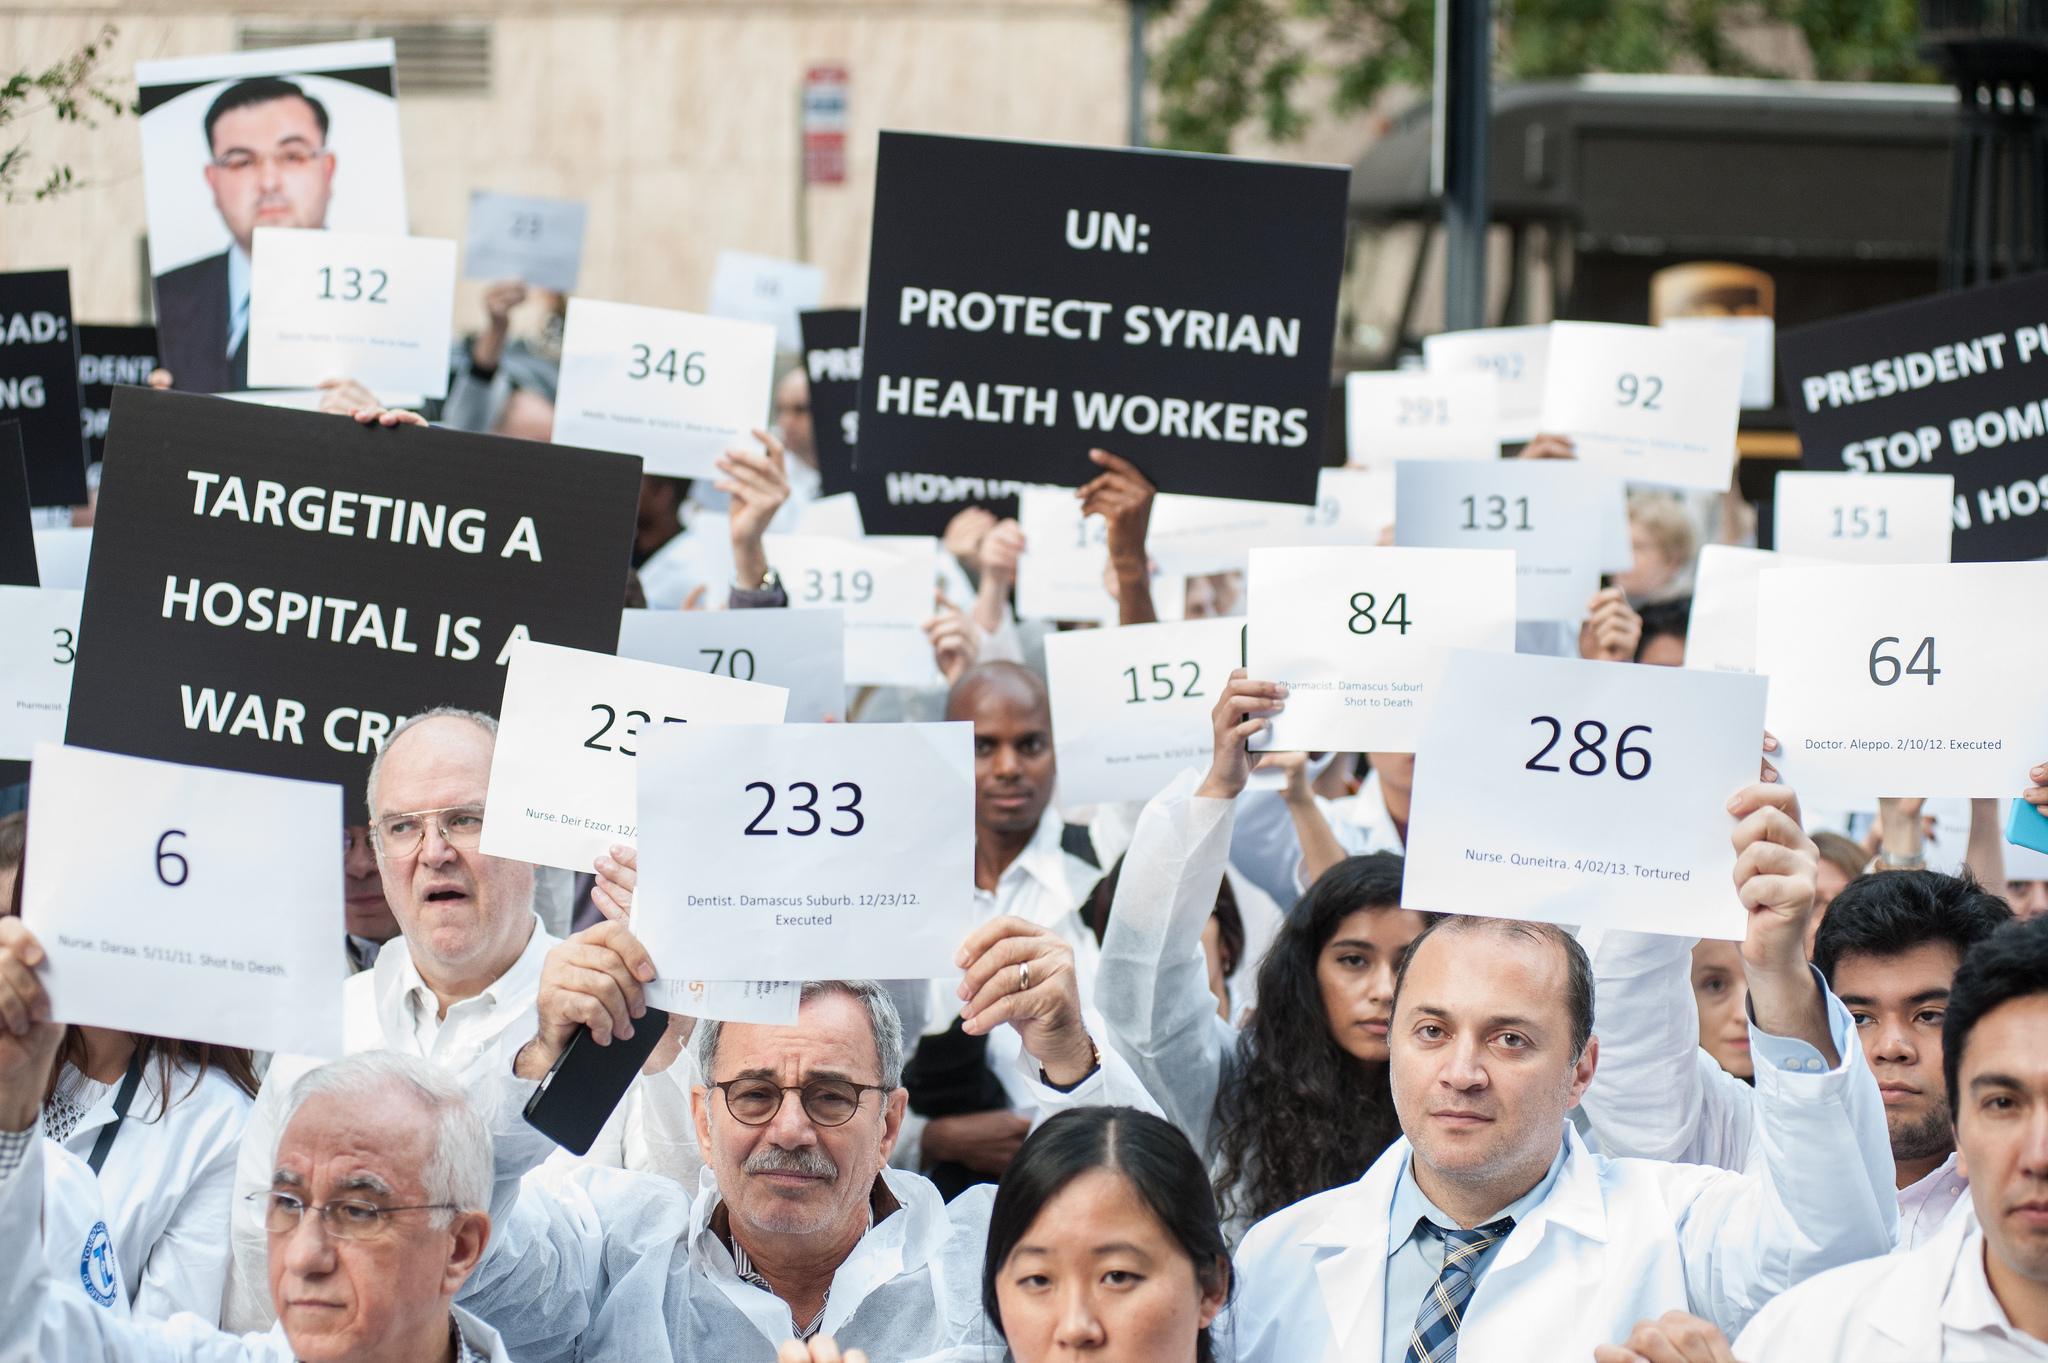 Grim plight of health care in Syria